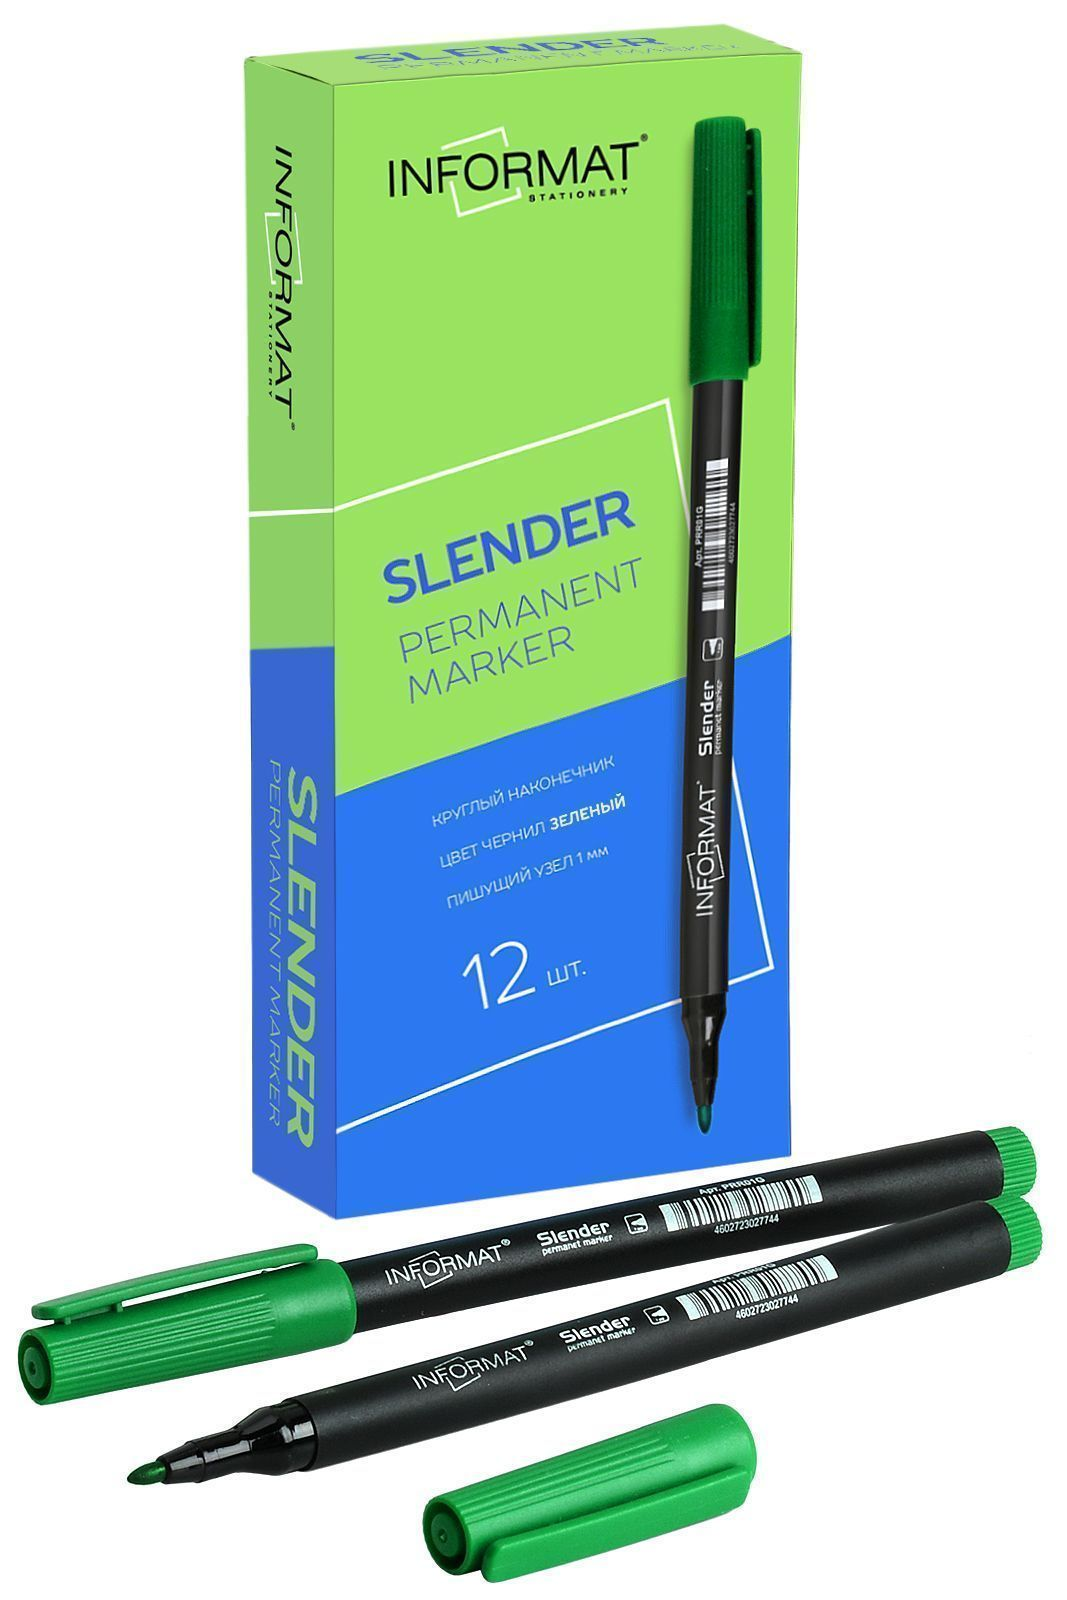 Маркер перманентный INFORMAT SLENDER 1 мм зеленый круглый